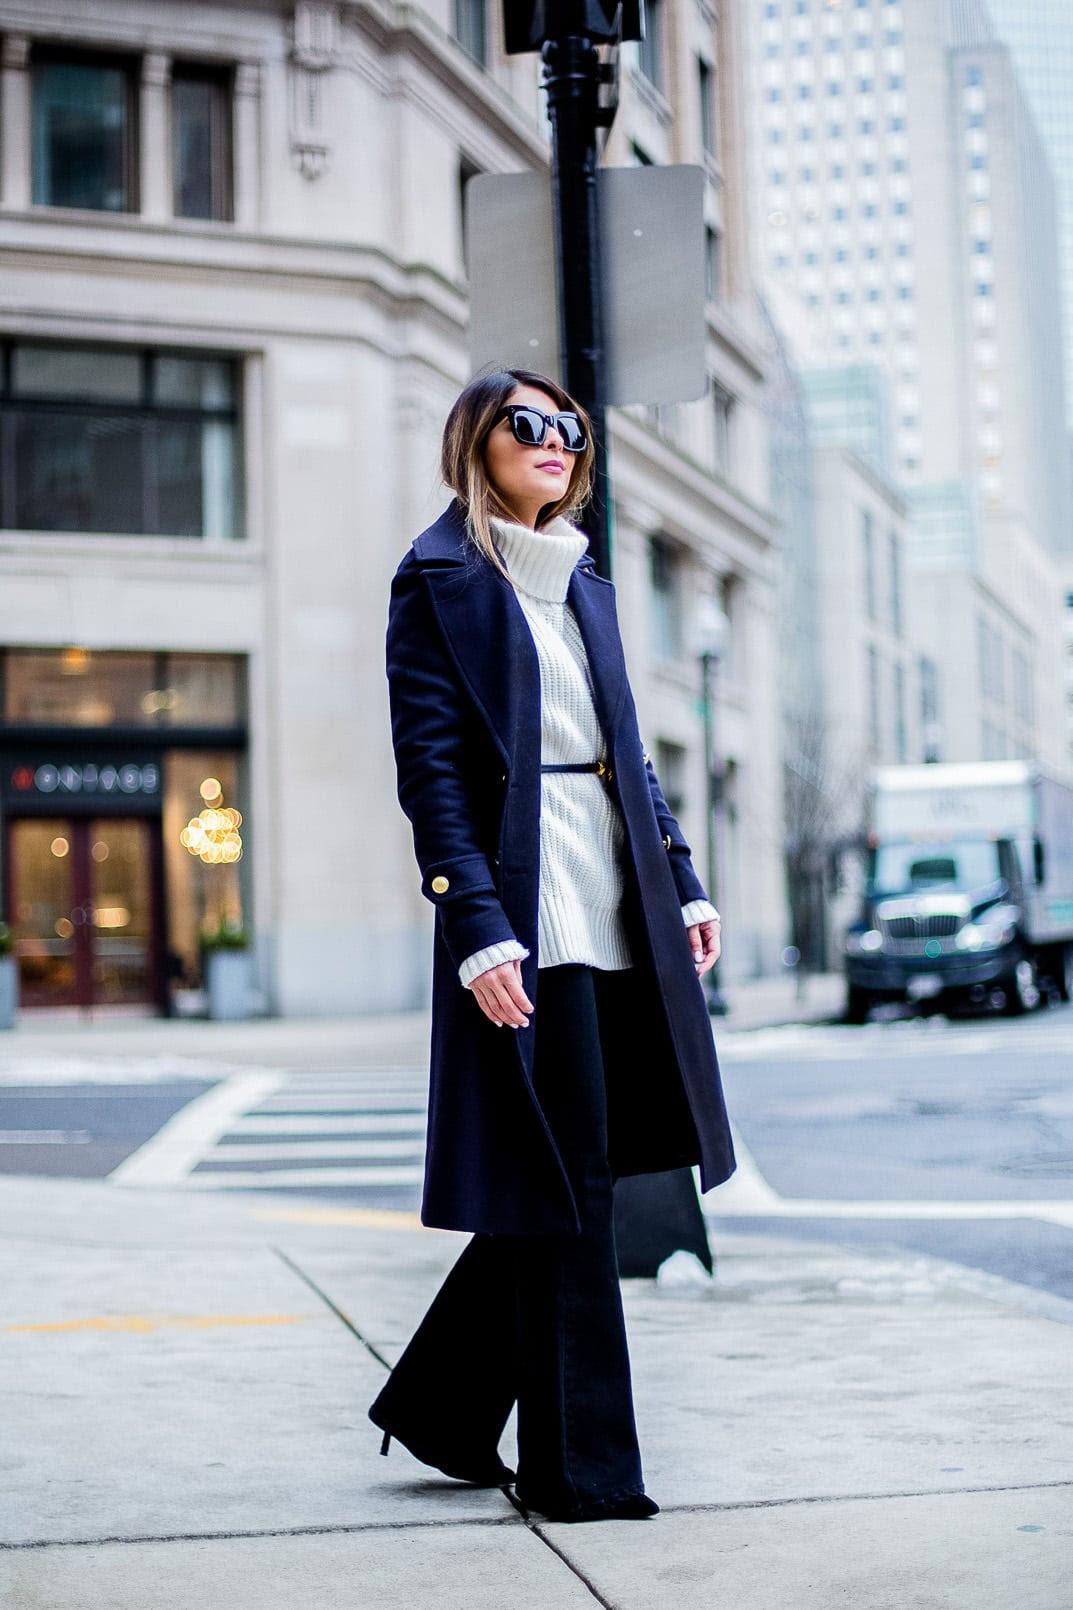 Pam Hetlinger, The Girl From Panama wearing an h&m navy coat, celine sunglasses, thin belt, mango flare jeans, white turtleneck sweater and chloe georgia bag.